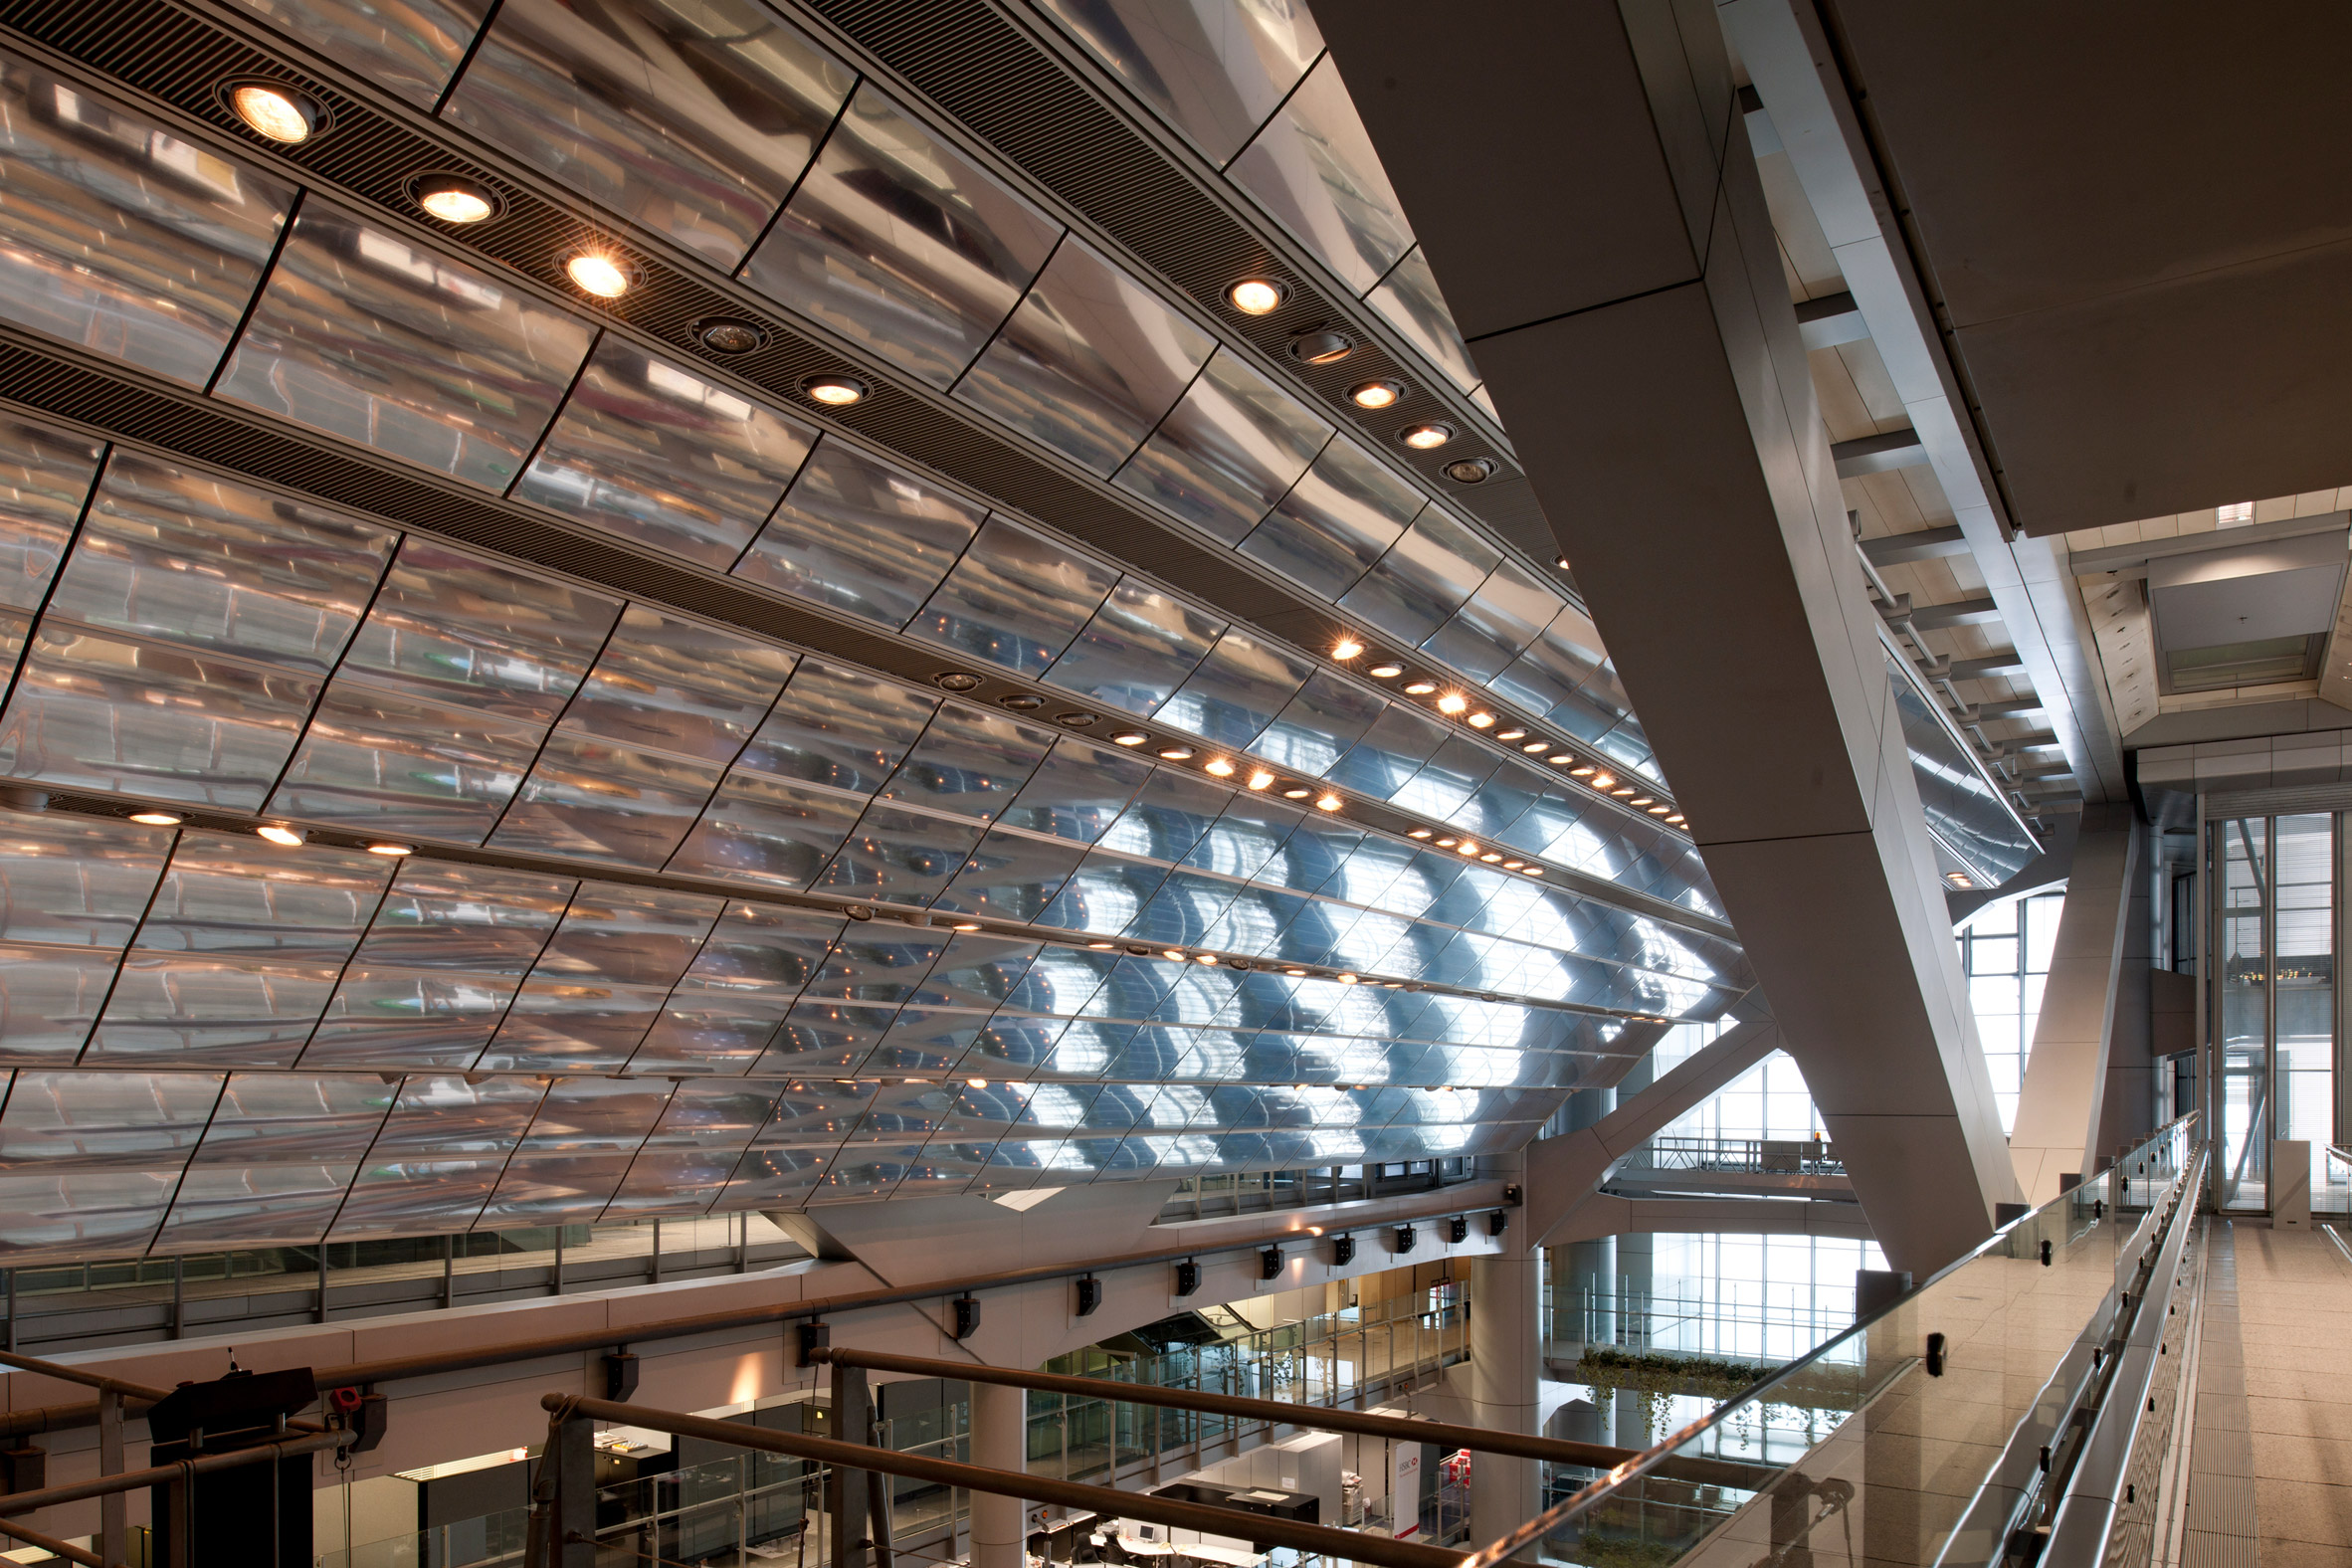 HSBC headquarters by Foster Associates